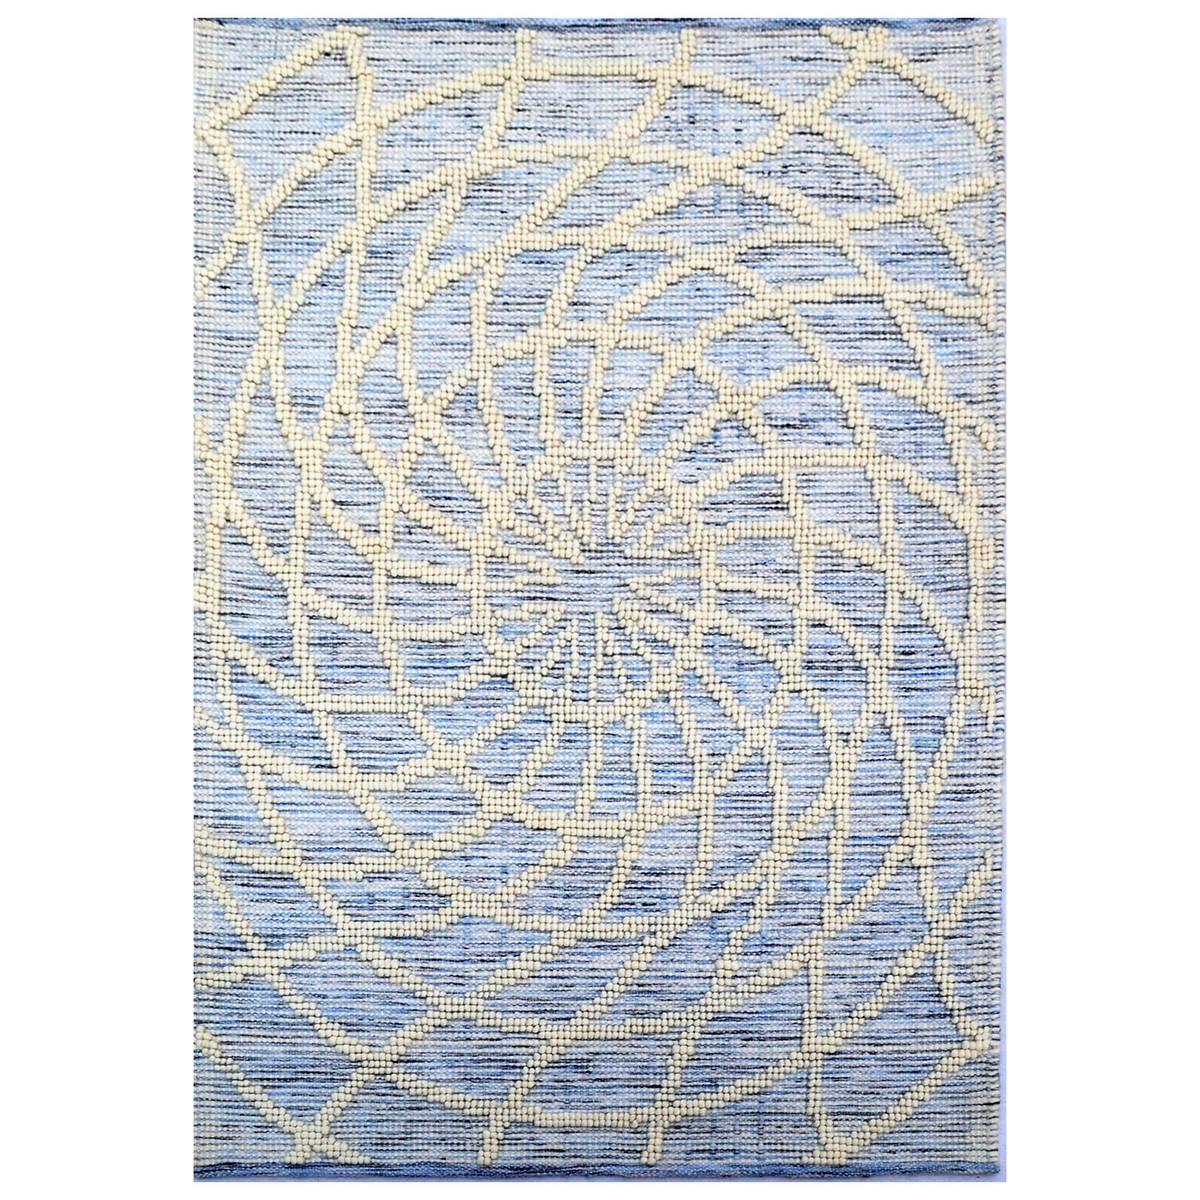 Zaal Handwoven Wool Rug, 110x160cm